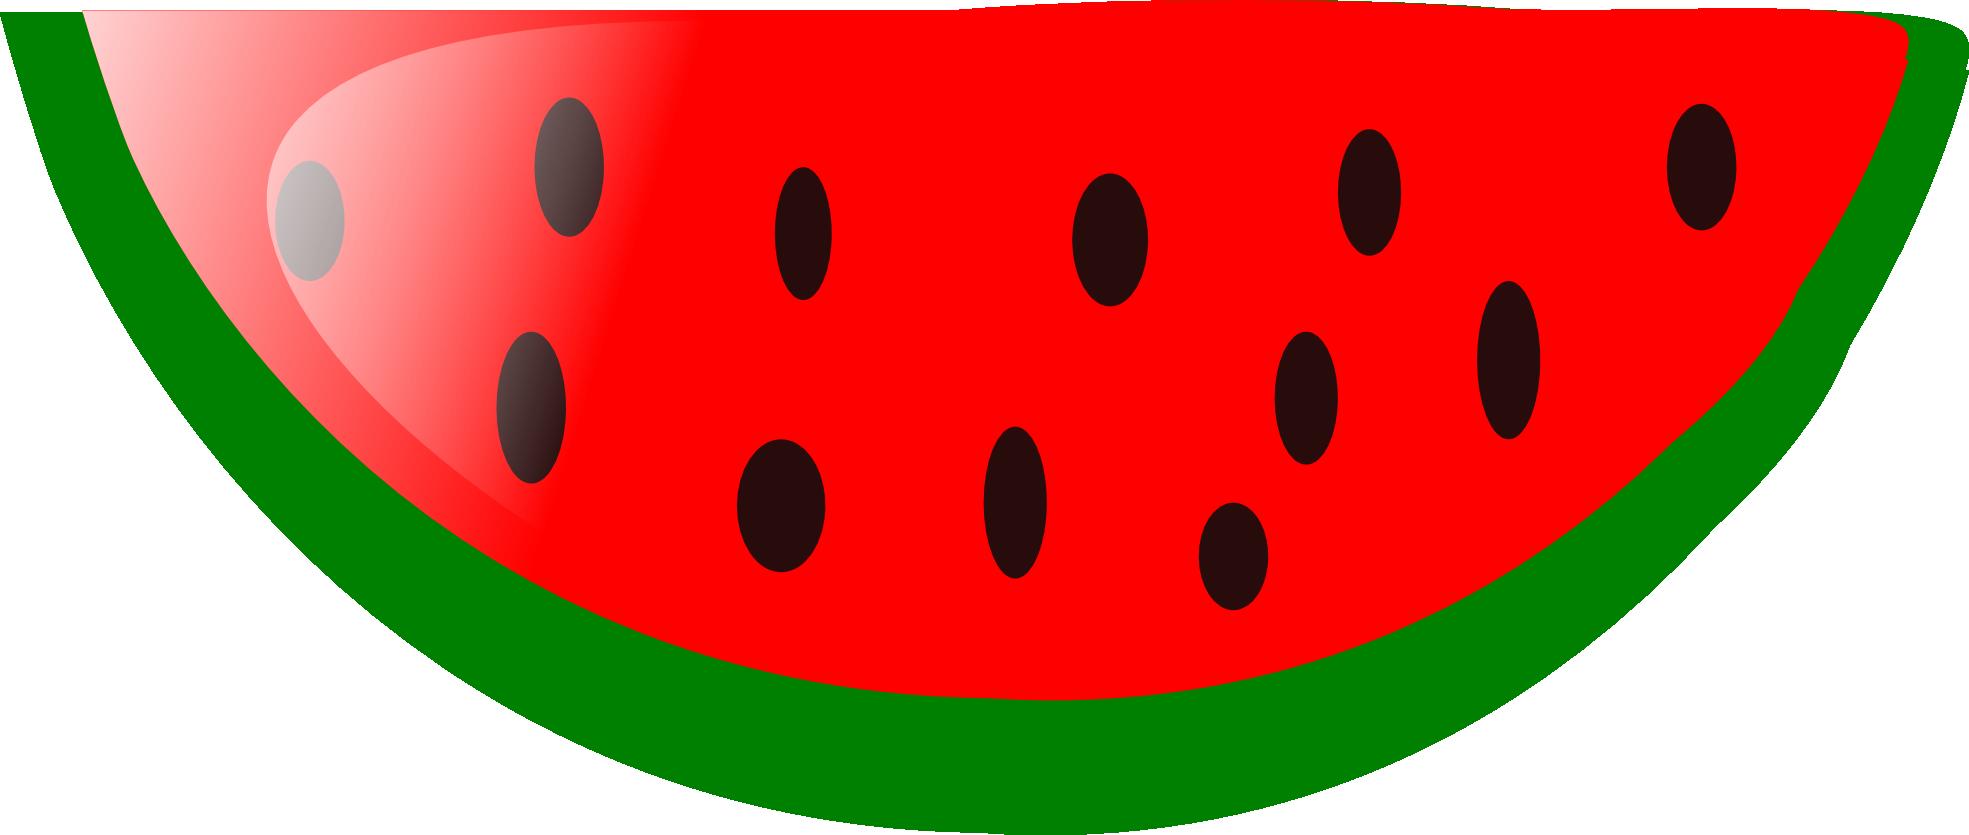 Watermelon clip art free clipart images 2.